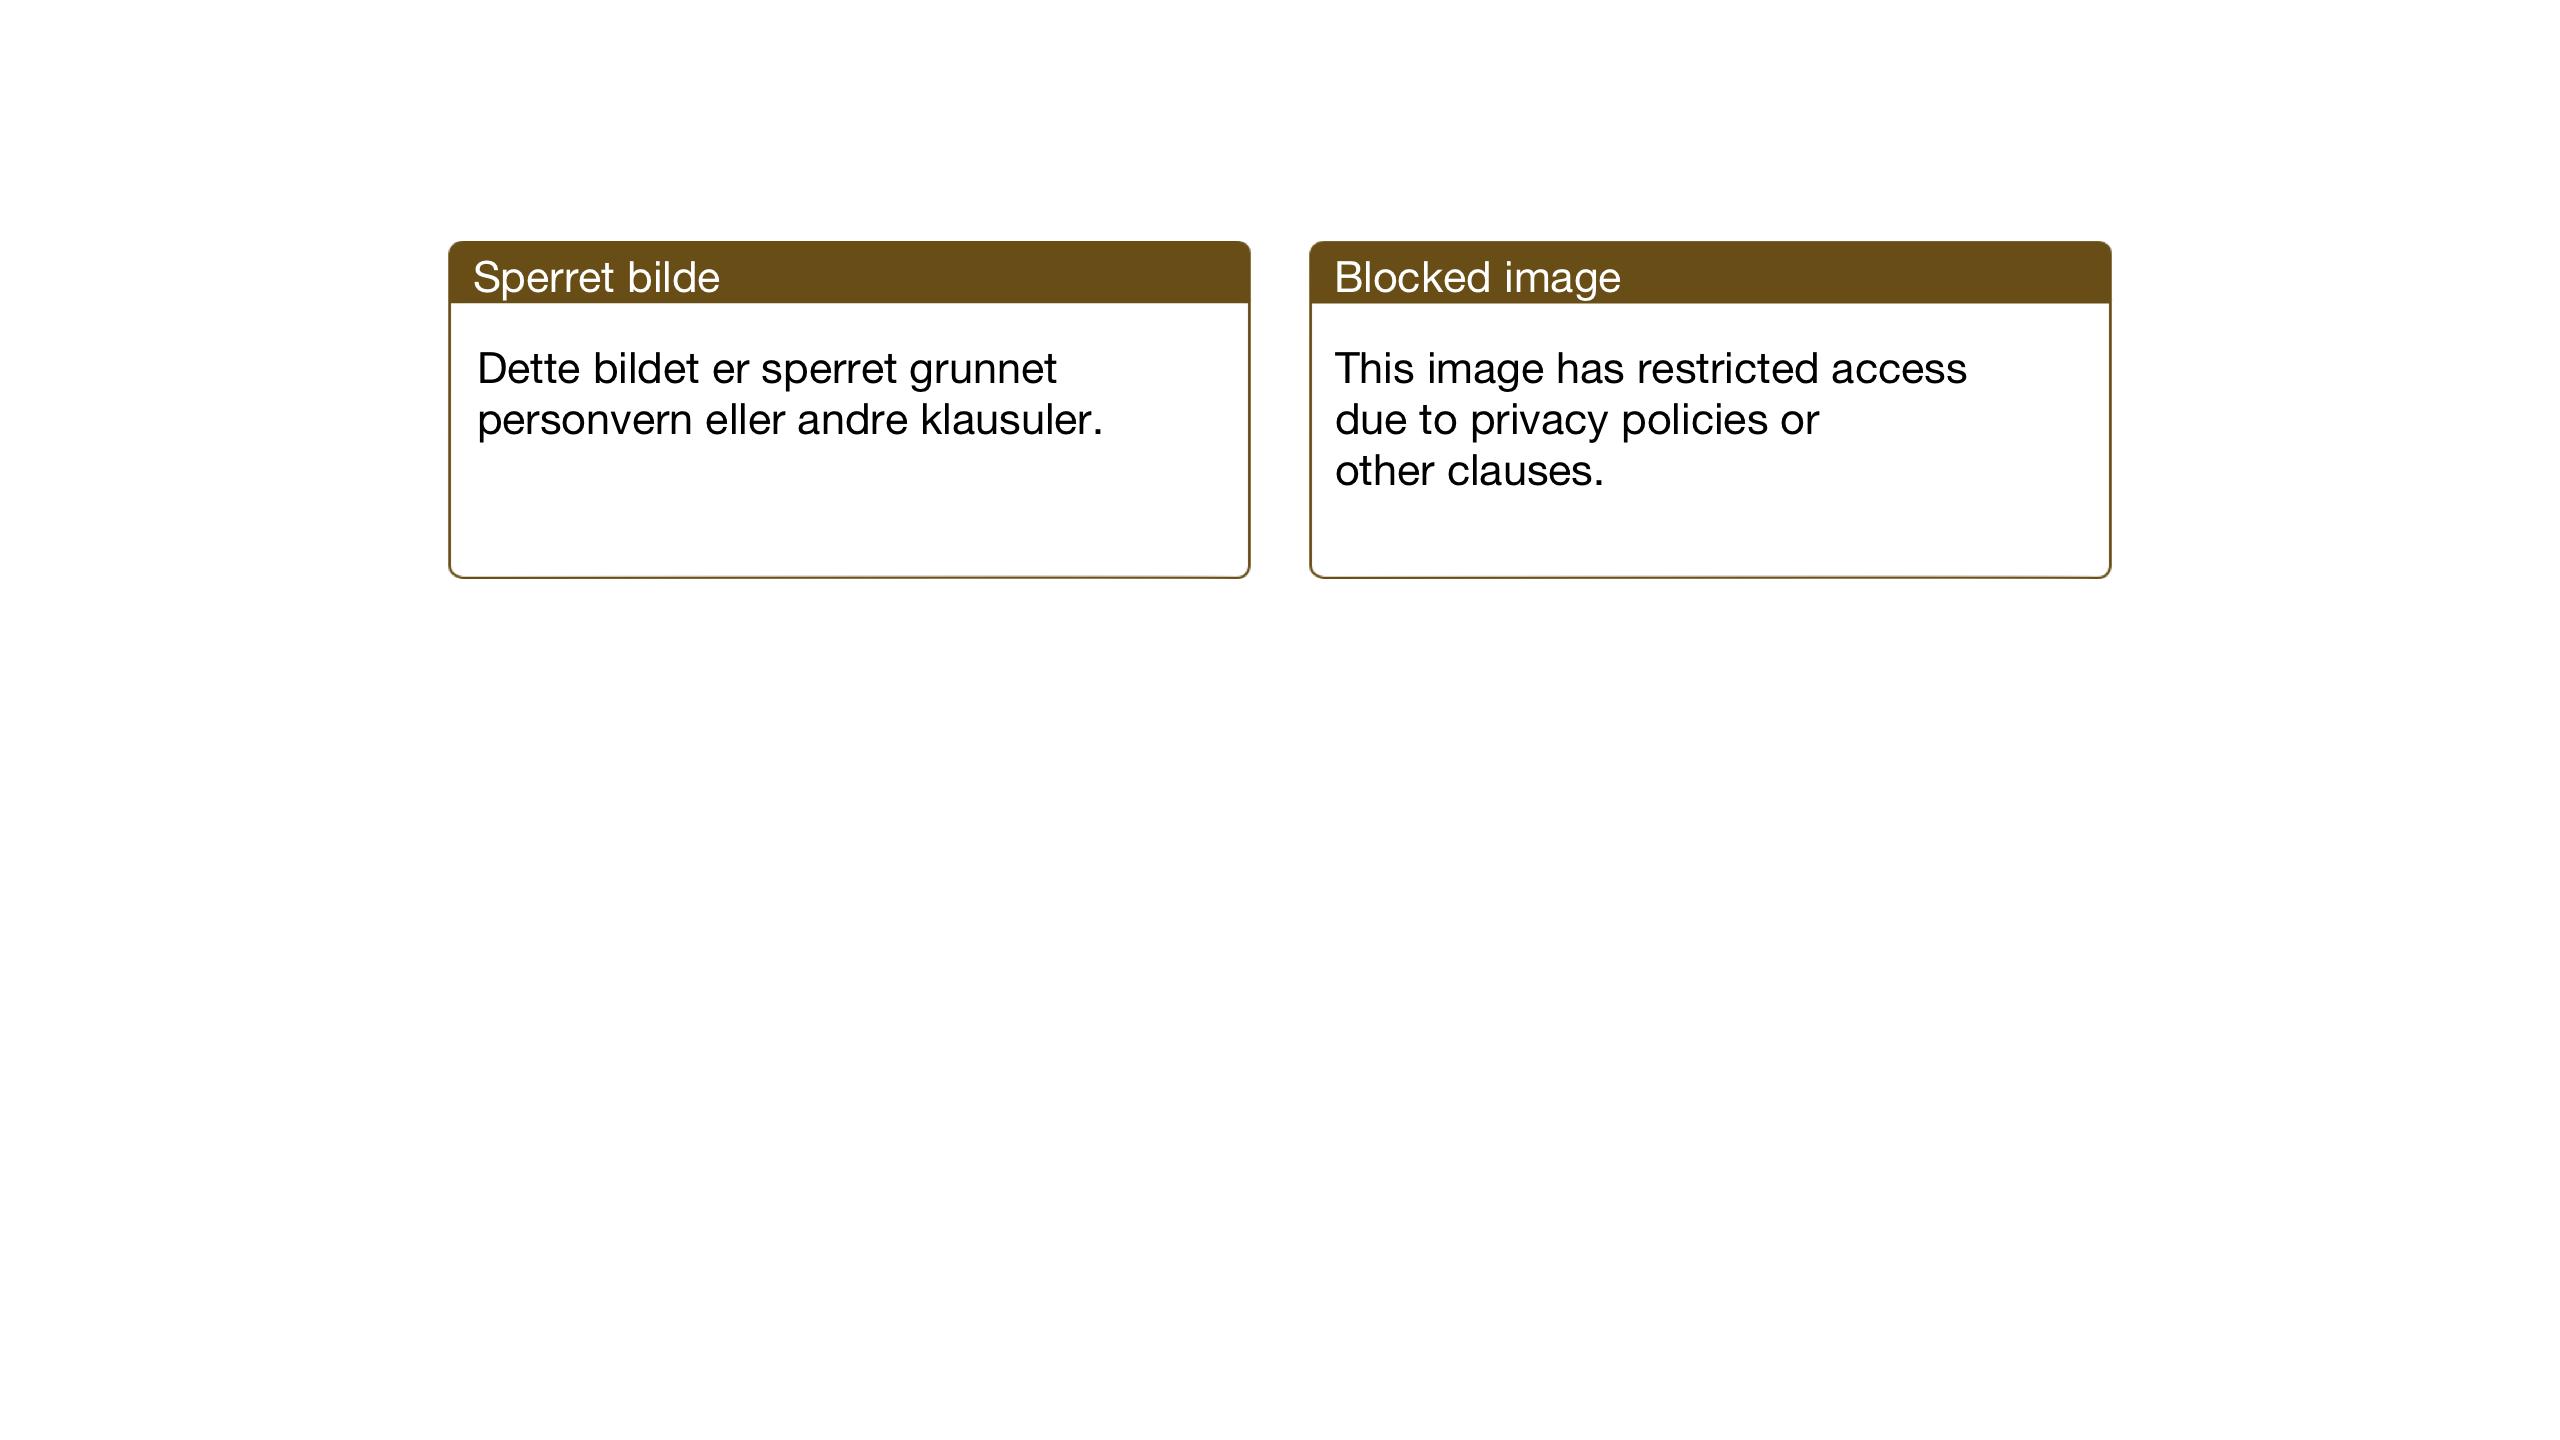 SAH, Vardal prestekontor, H/Ha/Haa/L0018: Ministerialbok nr. 18, 1930-1945, s. 173